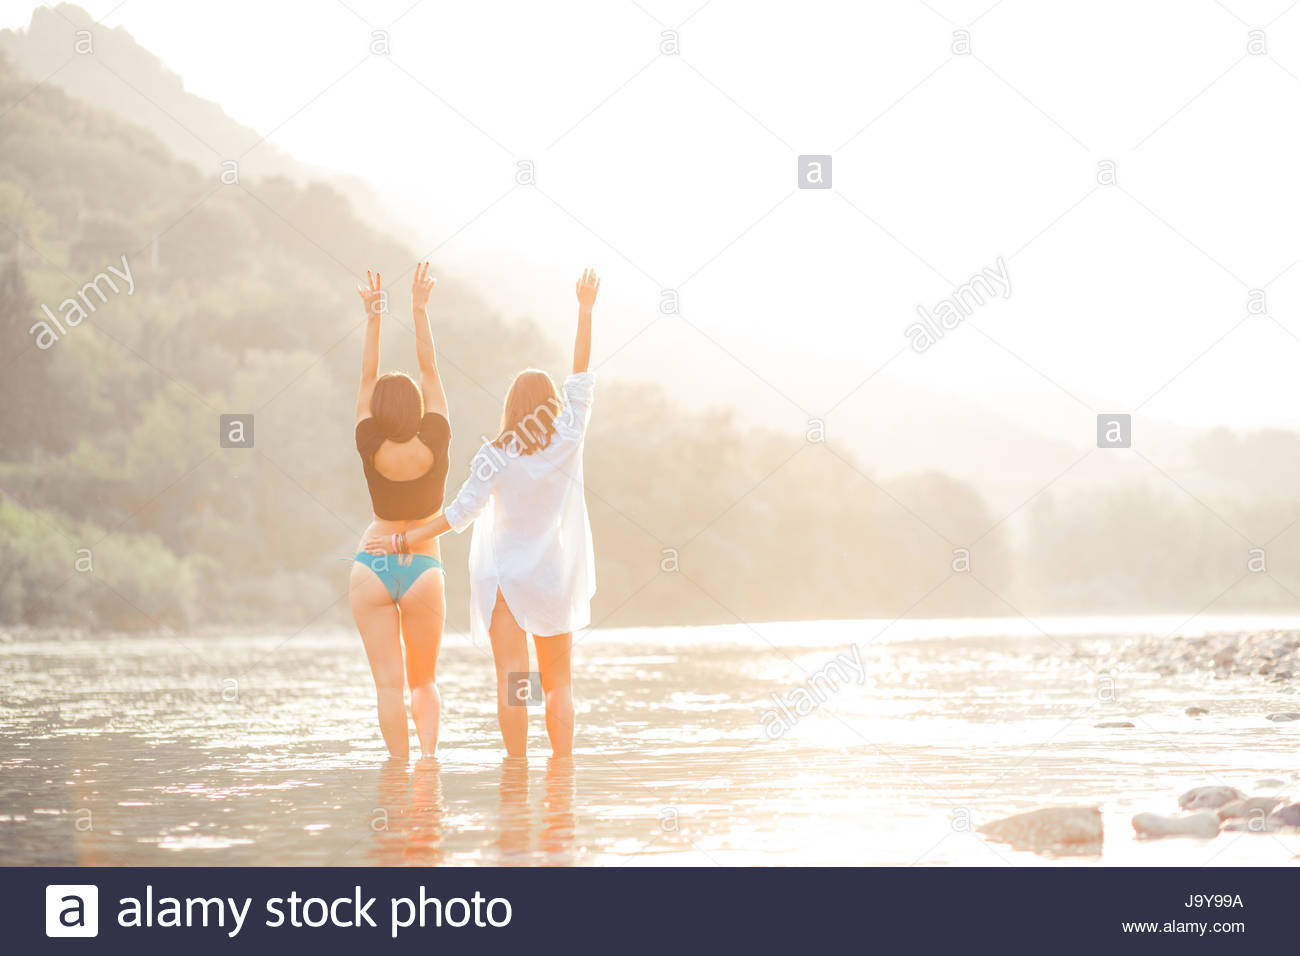 Junge Frauen am Strand im Sonnenuntergang, gute Zeit Stockbild